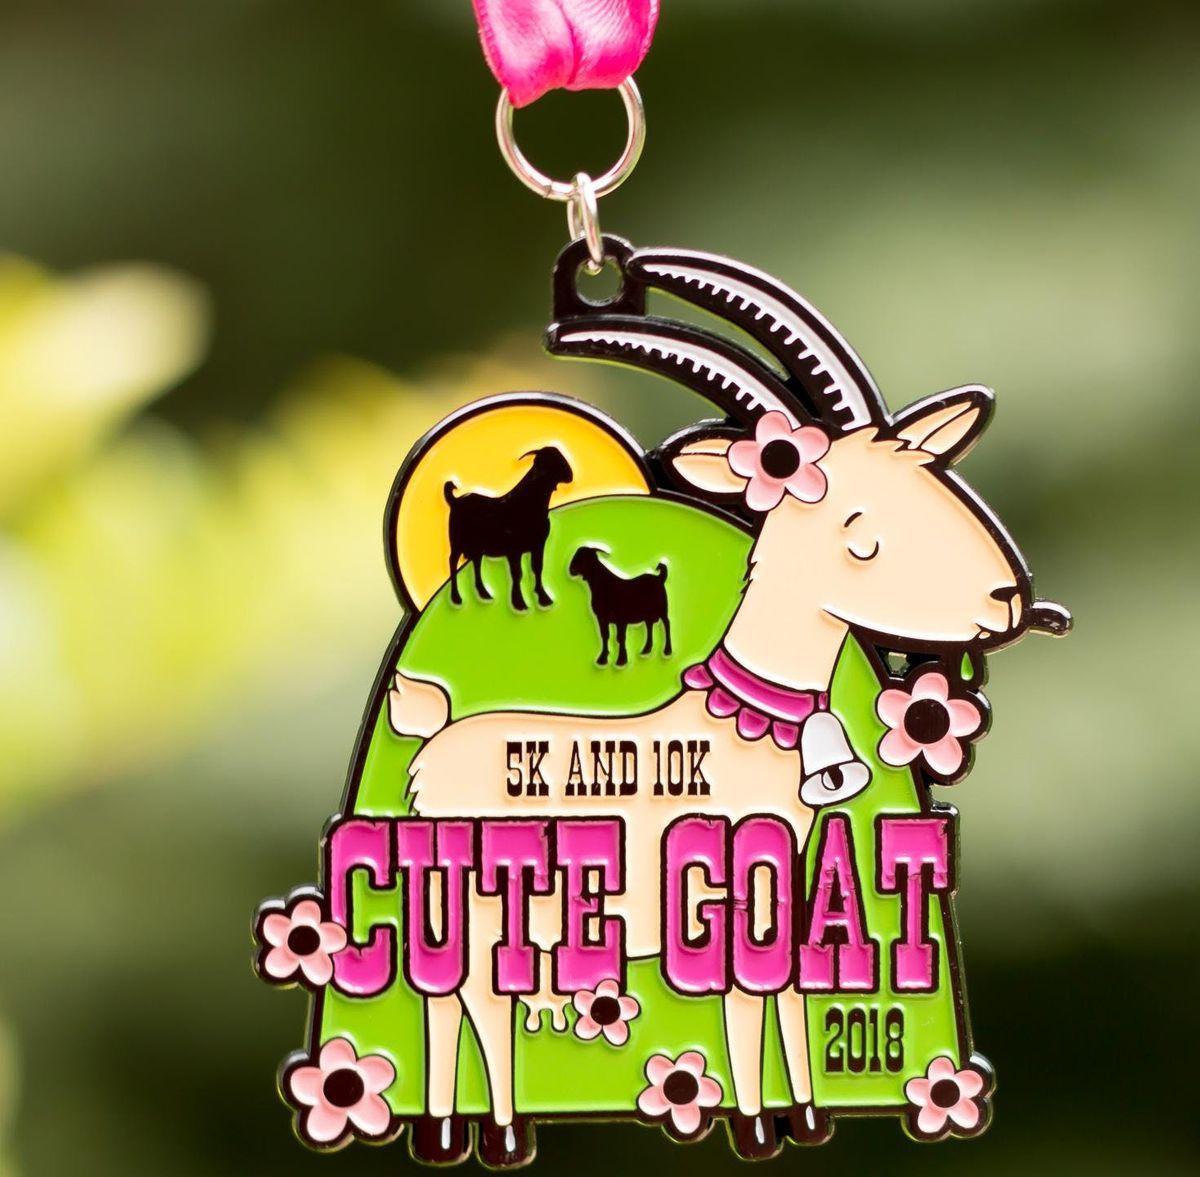 Now Only 10 Cute Goat 5K & 10K -Cincinnati